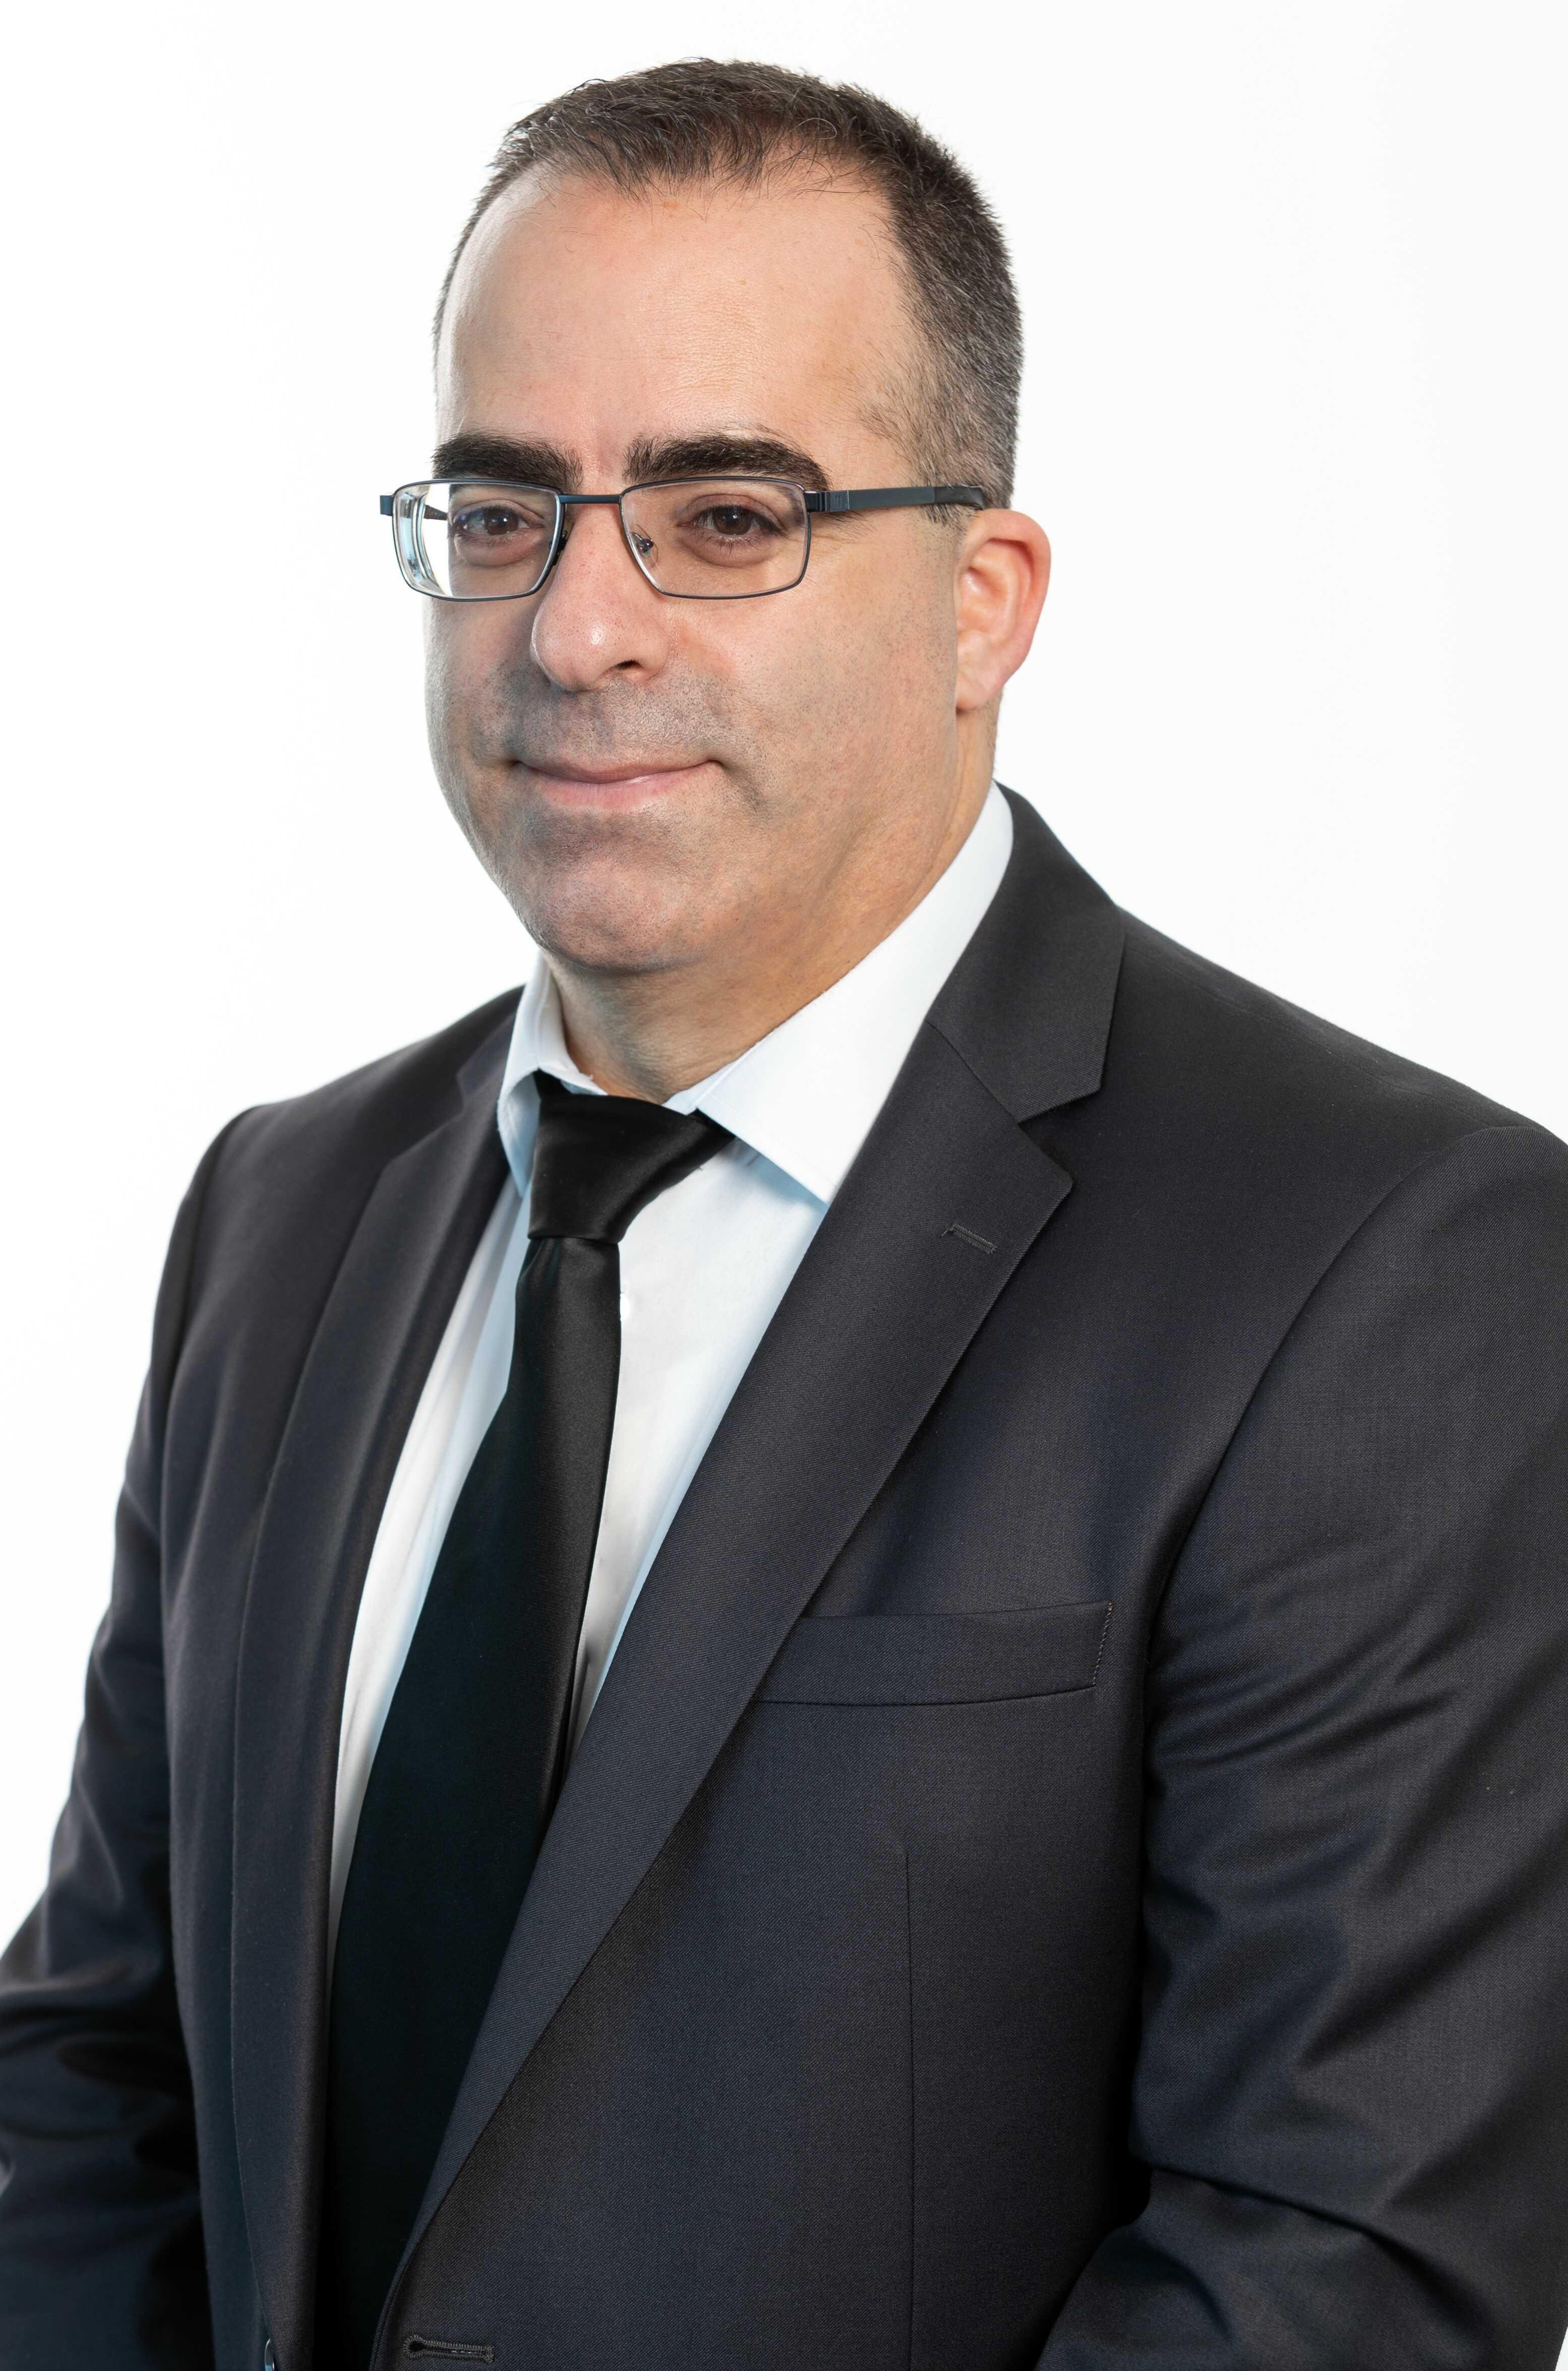 Adv. Reafel Yulzari